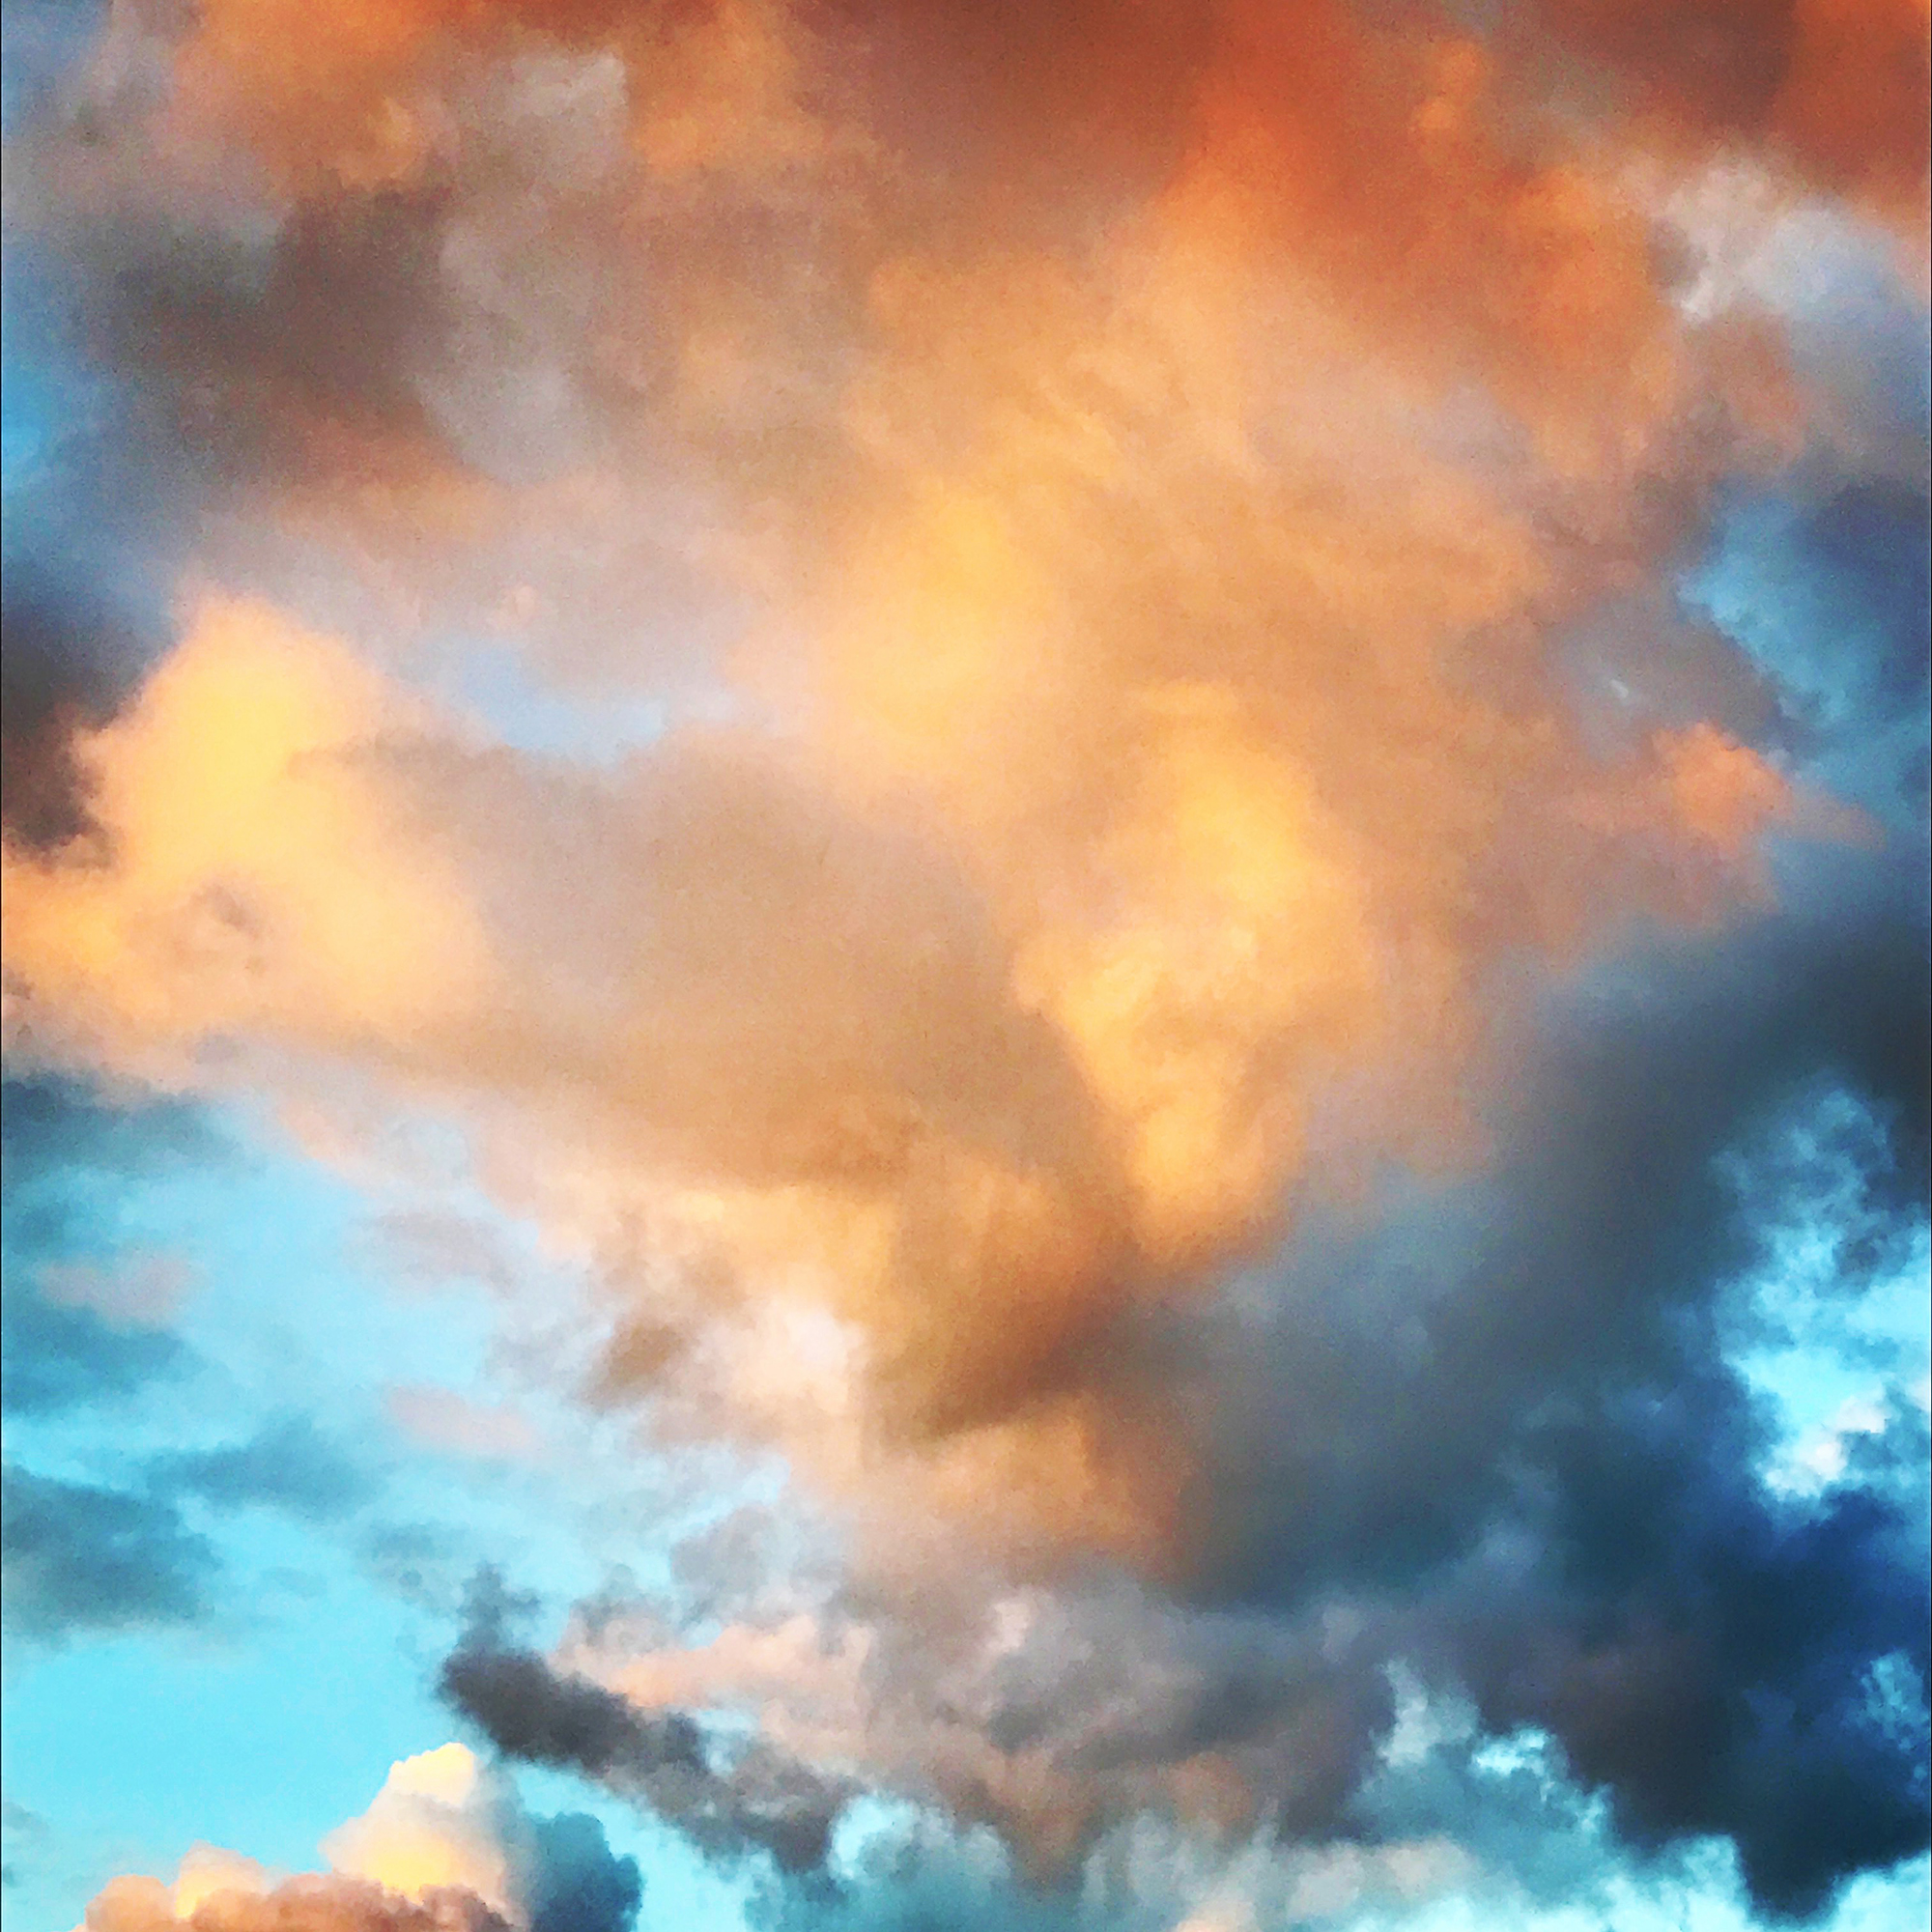 The sky from my backyard